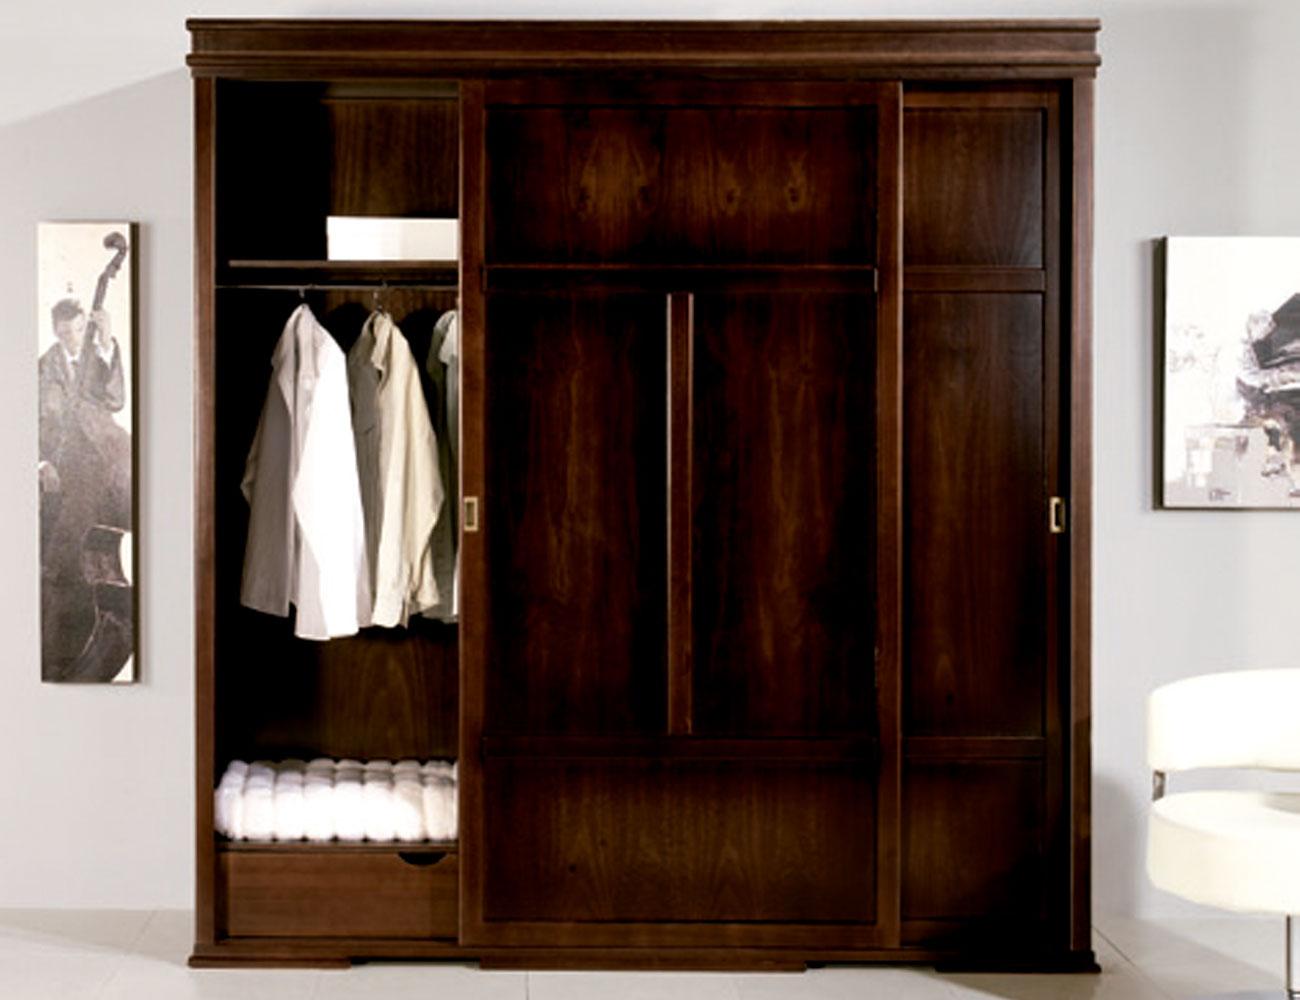 A 40 armario corredera detalle interior1